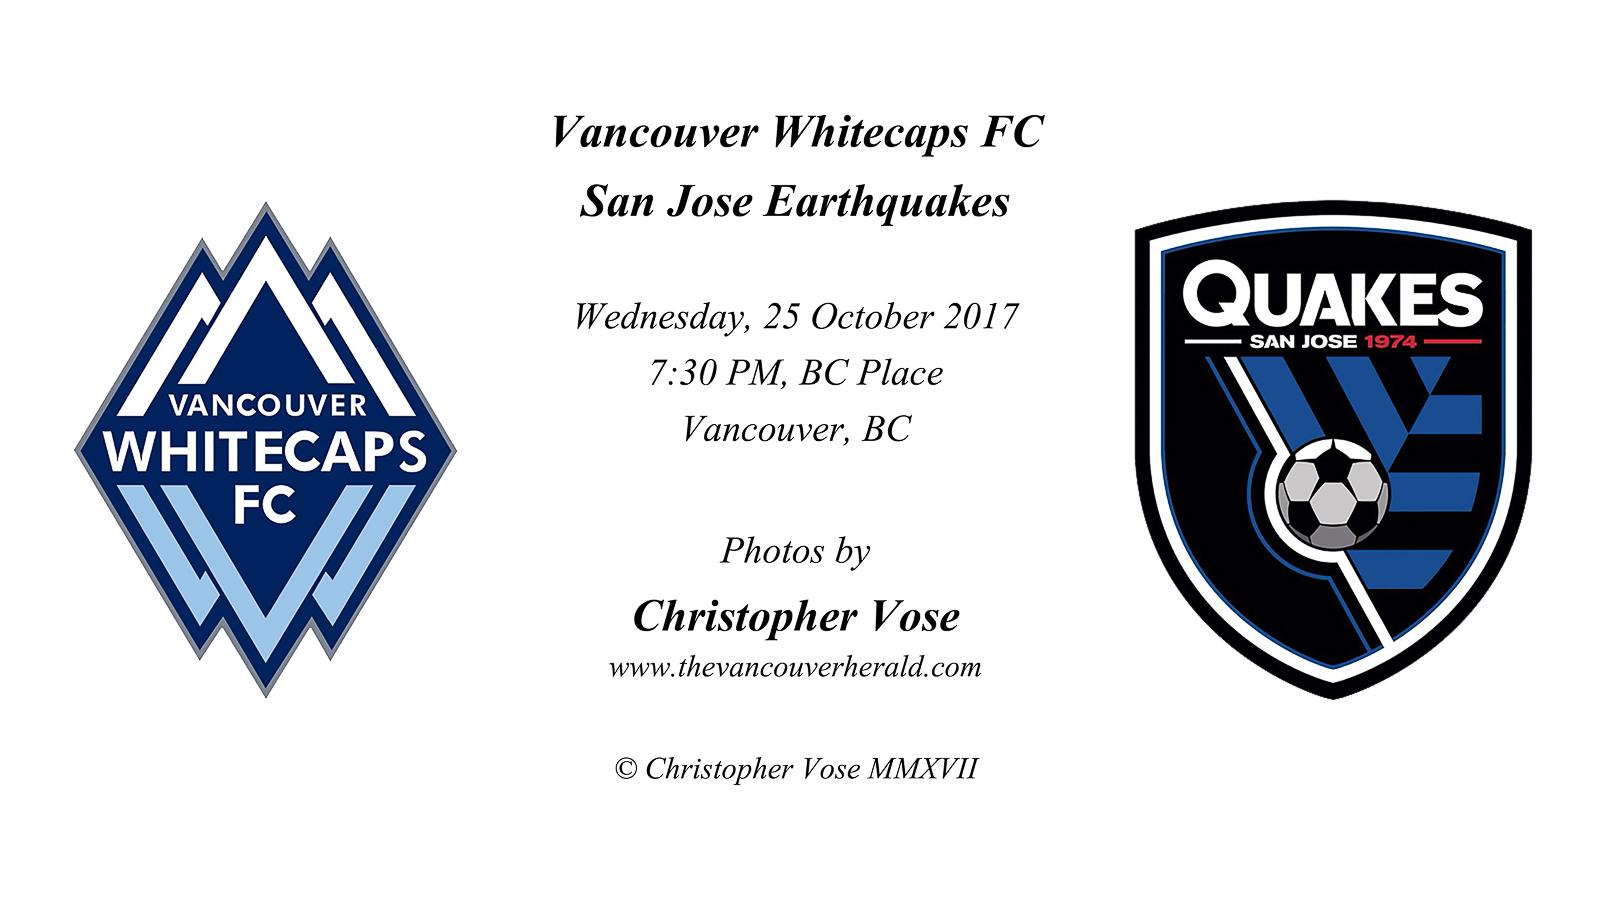 2017-10-25 Vancouver Whitecaps FC v San Jose Earthquakes.jpg